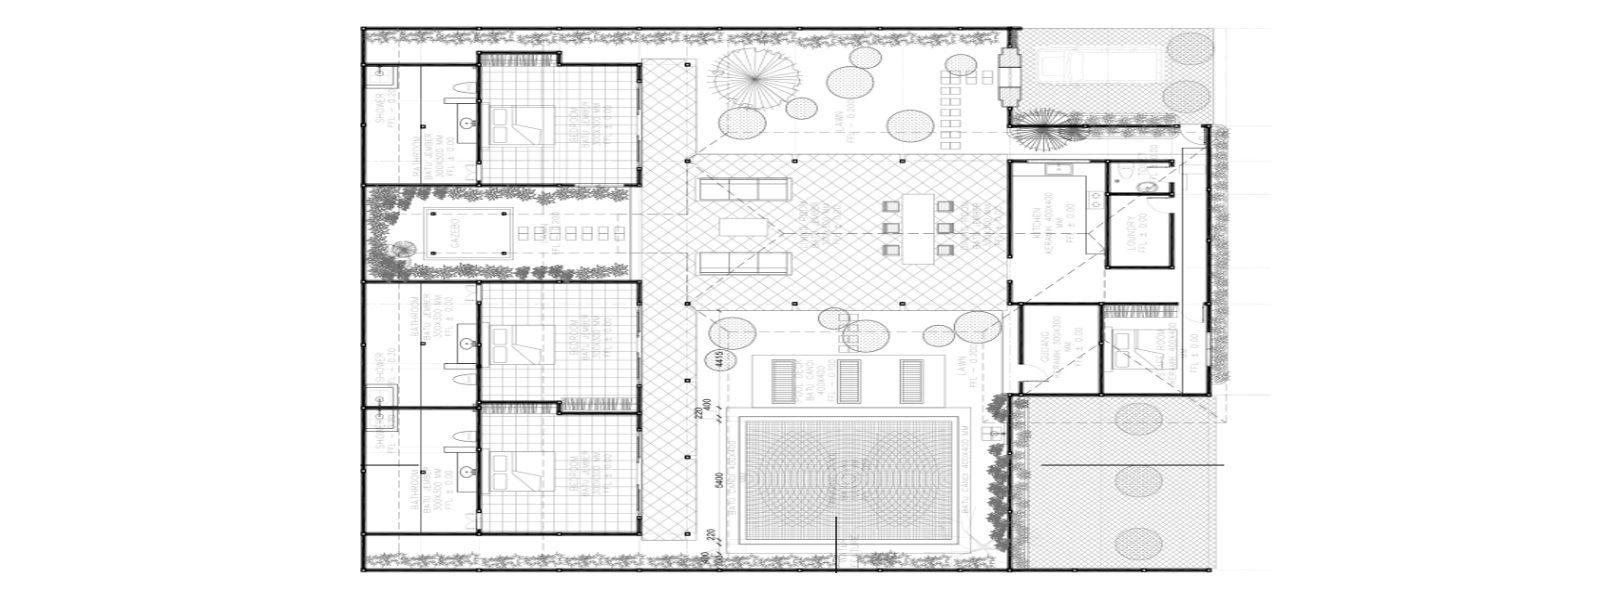 Villa Damai Manis Floorplan | Seminyak, Bali